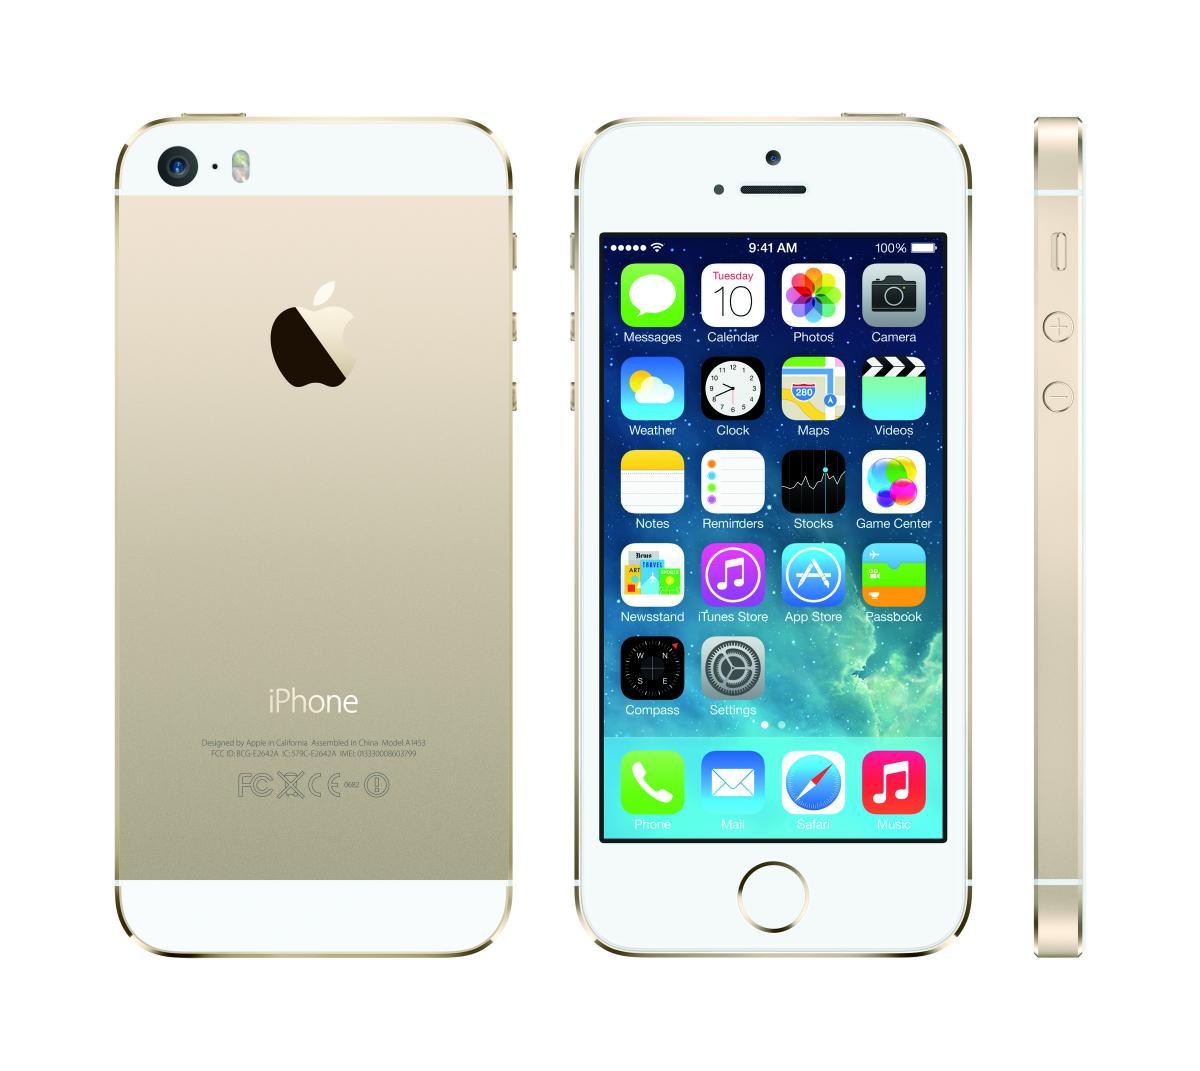 Iphone S Sosh